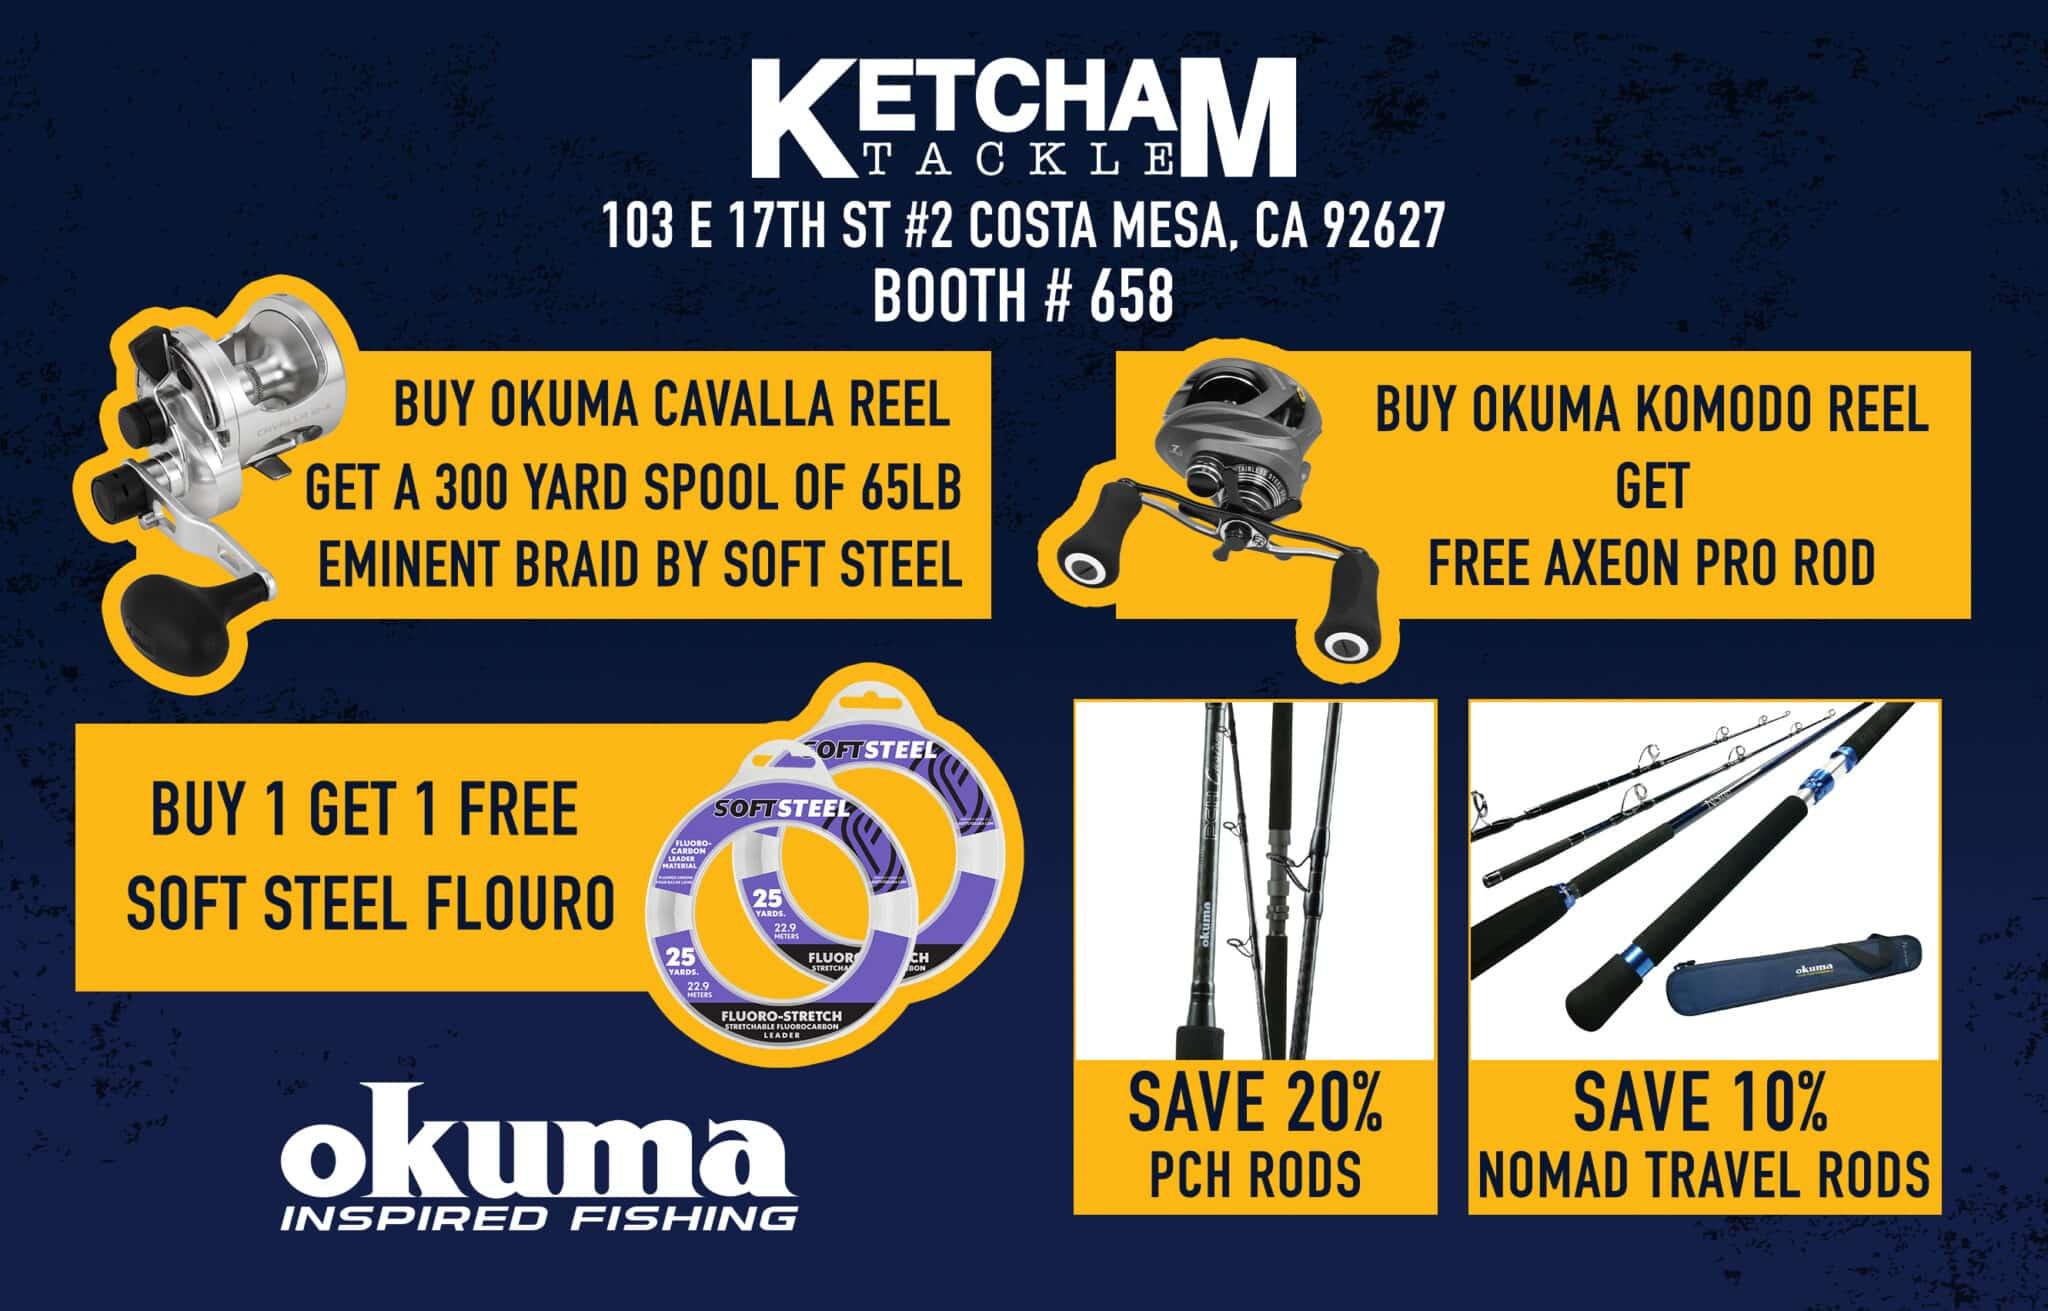 Ketcham Okuma Deals